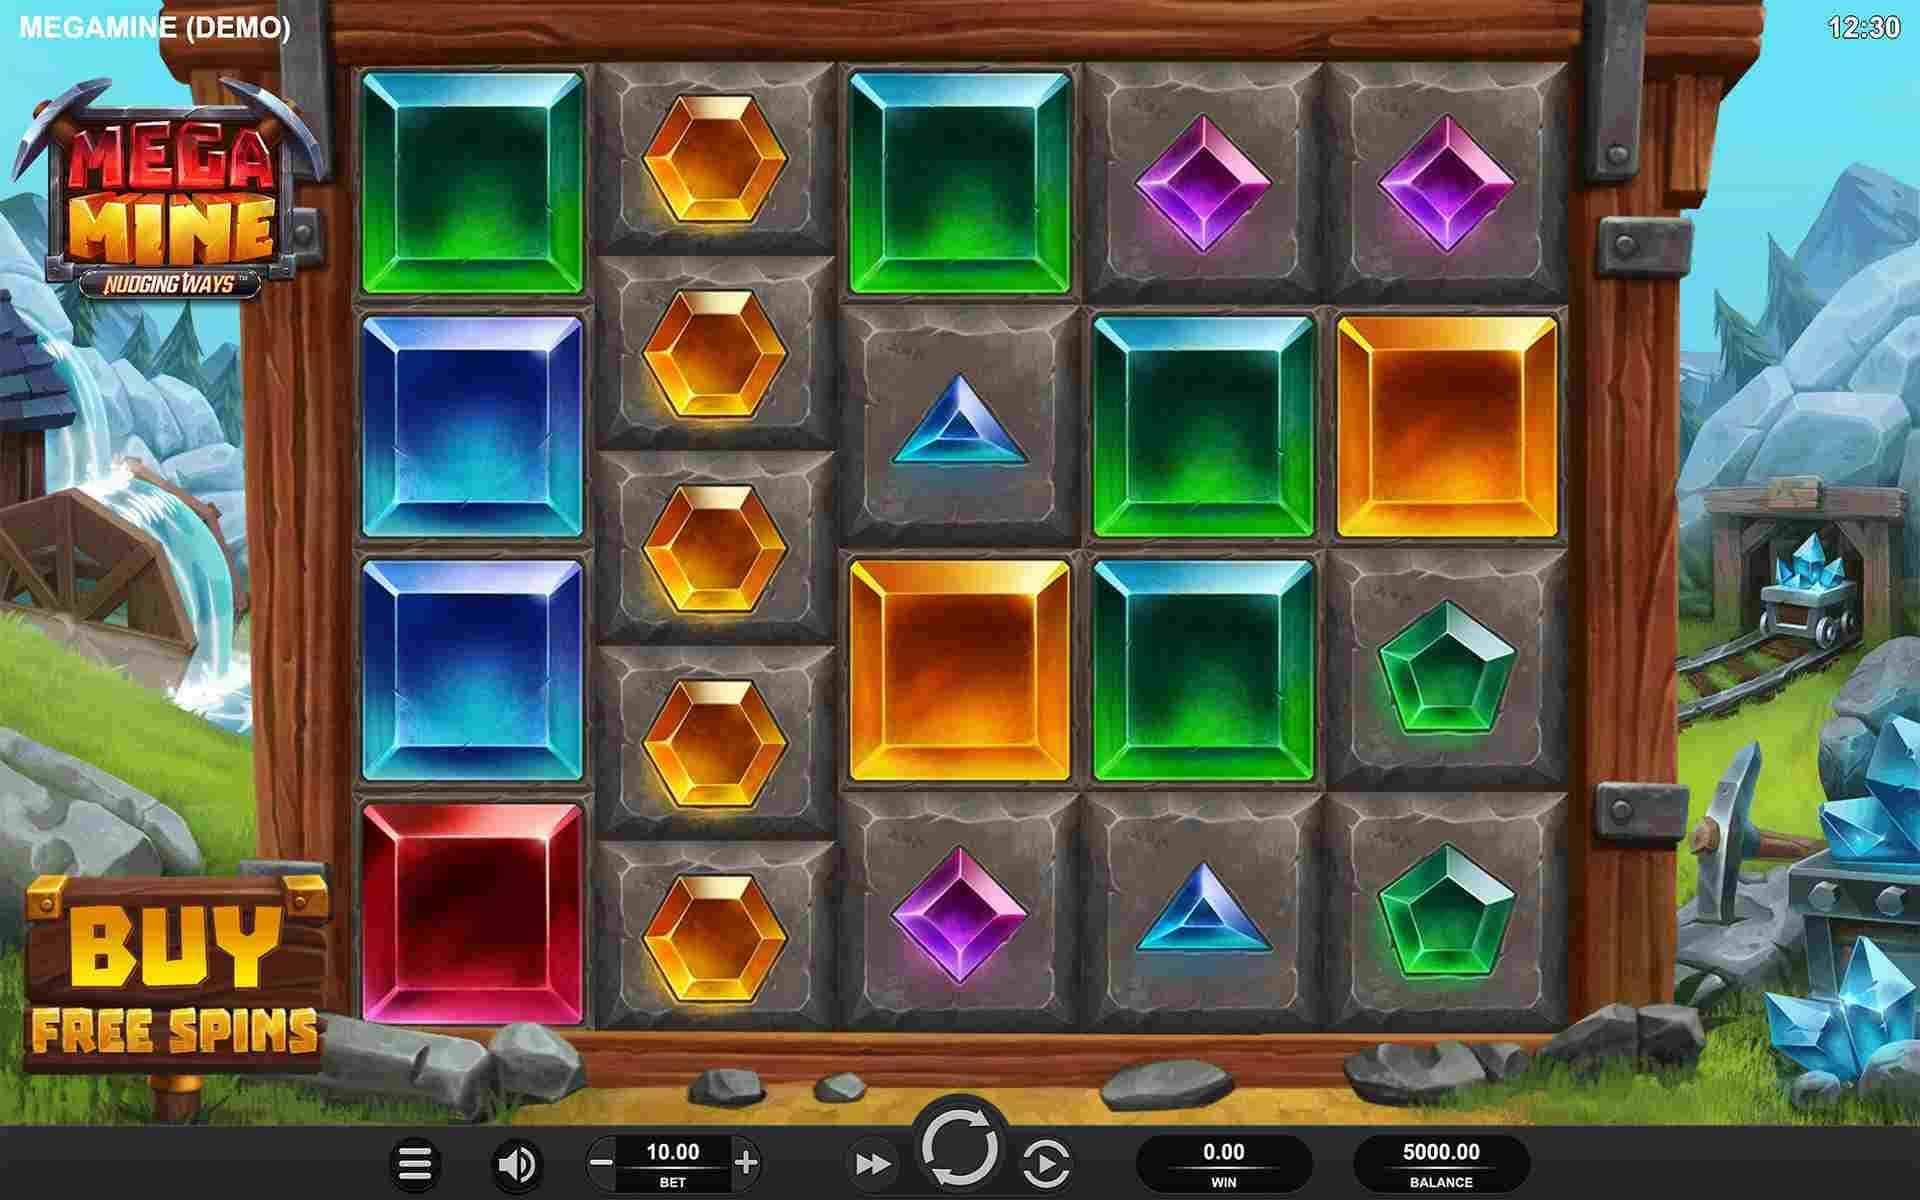 Mega Mine Nudging Ways Base Game